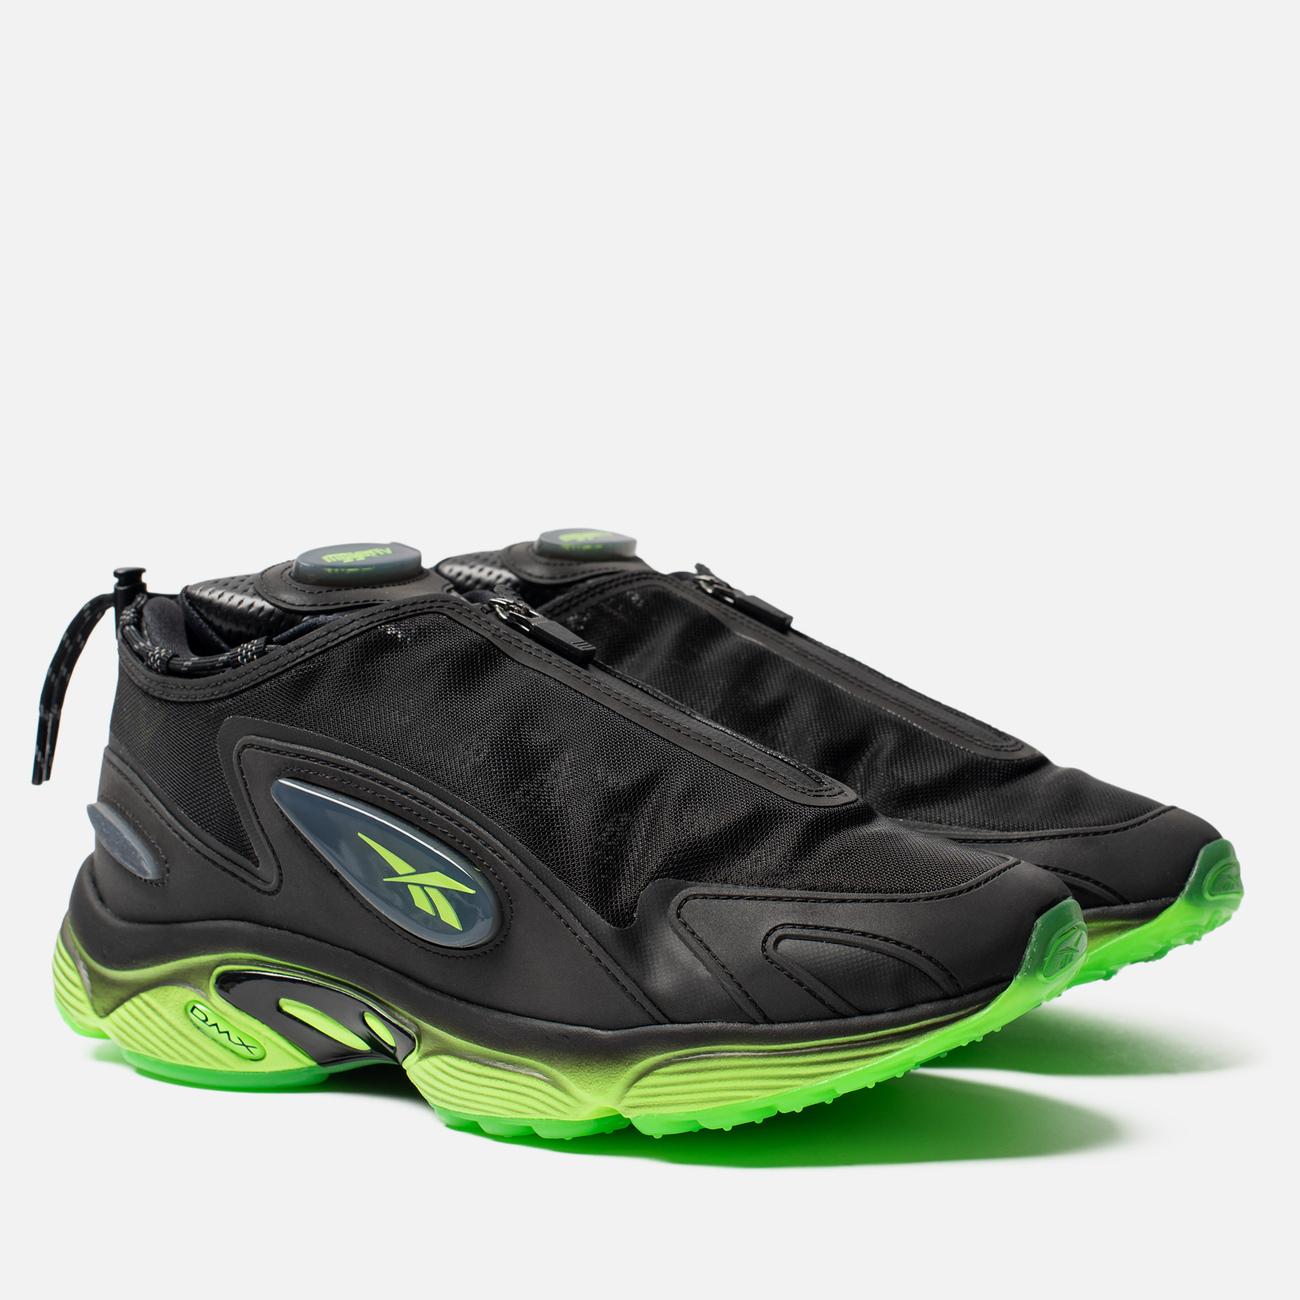 Мужские кроссовки Reebok x MISBHV Daytona DMX Black/Black/Green